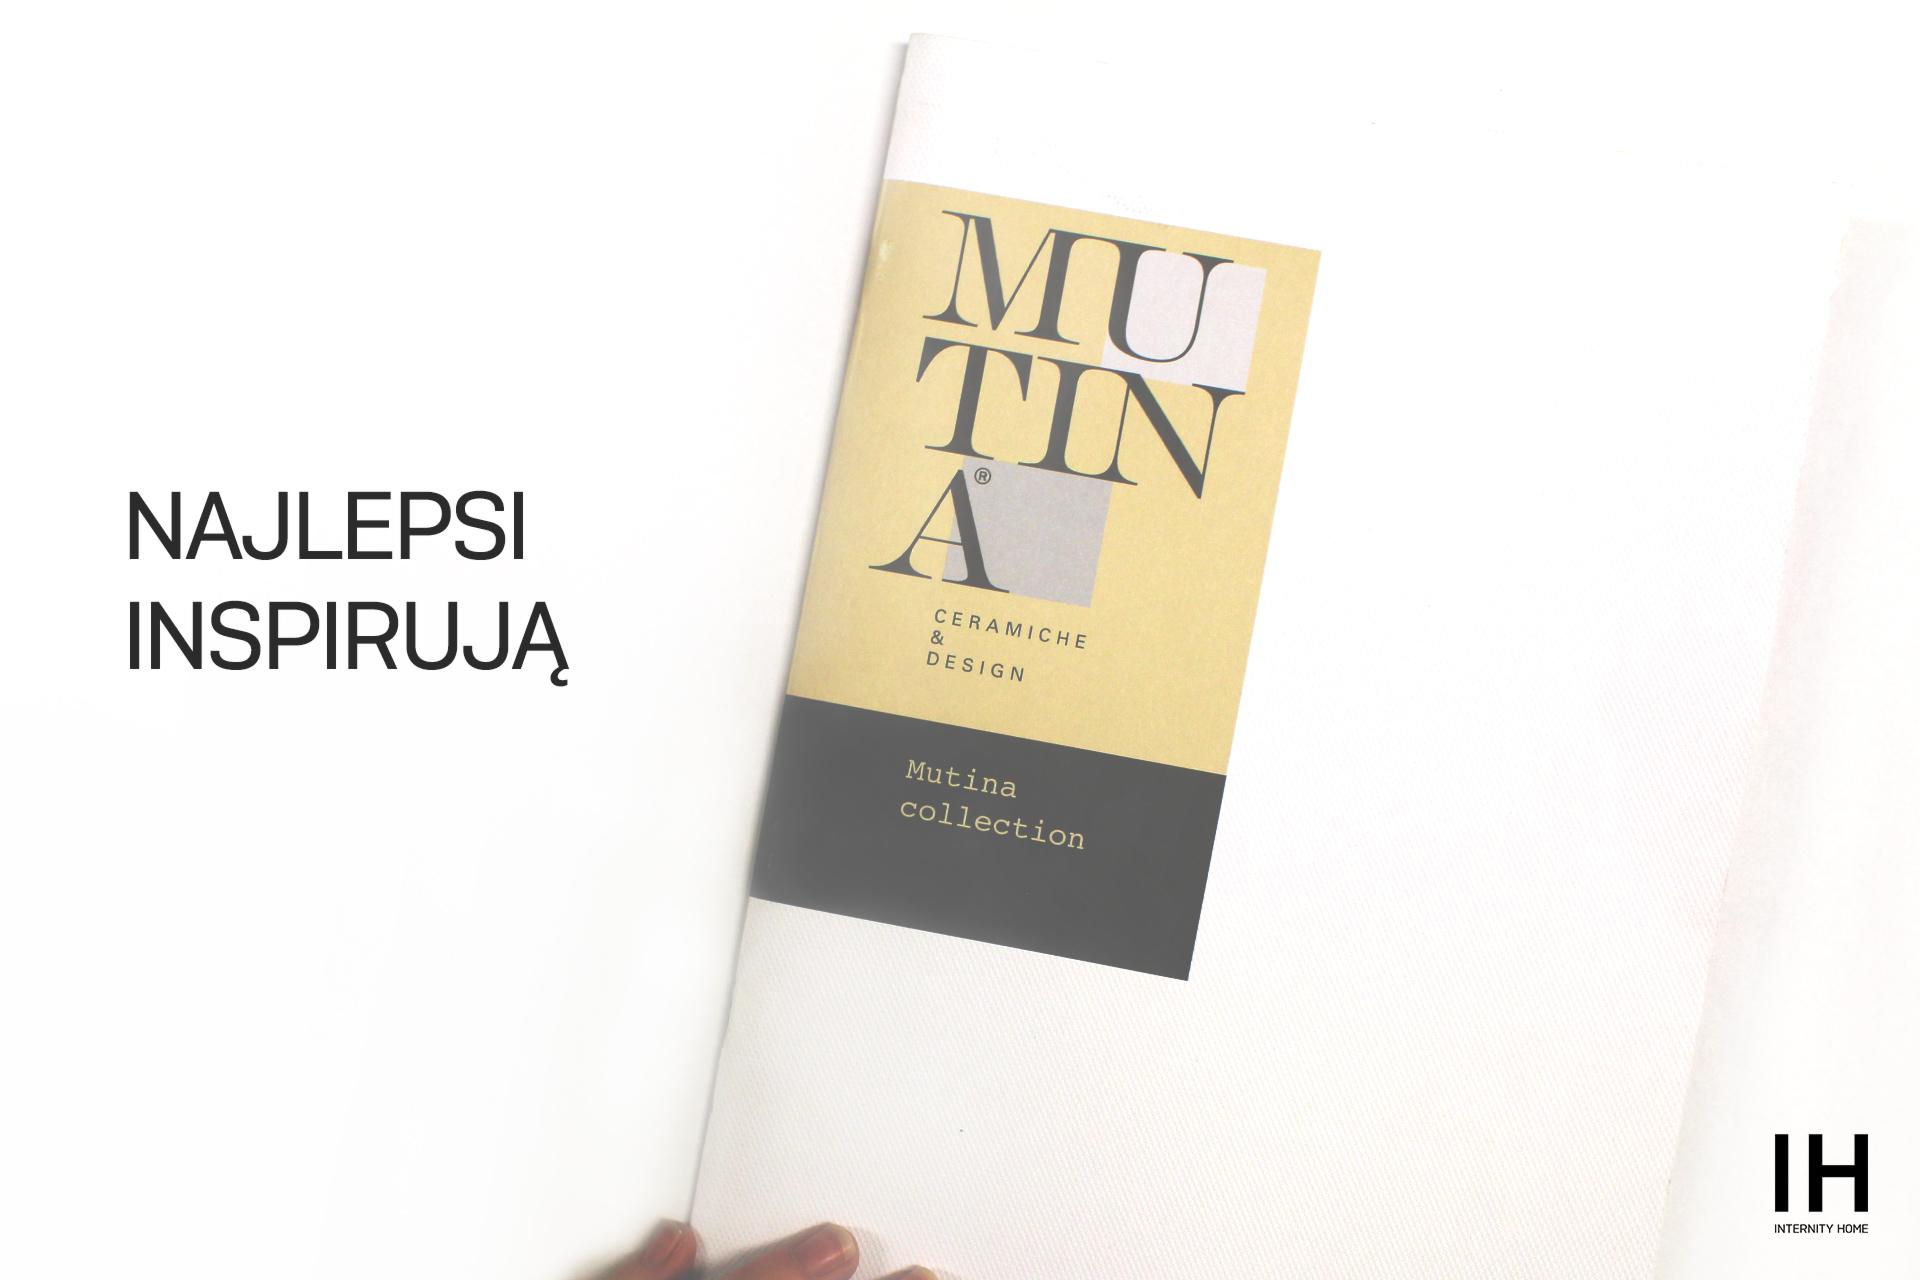 katalog-mutina-collection